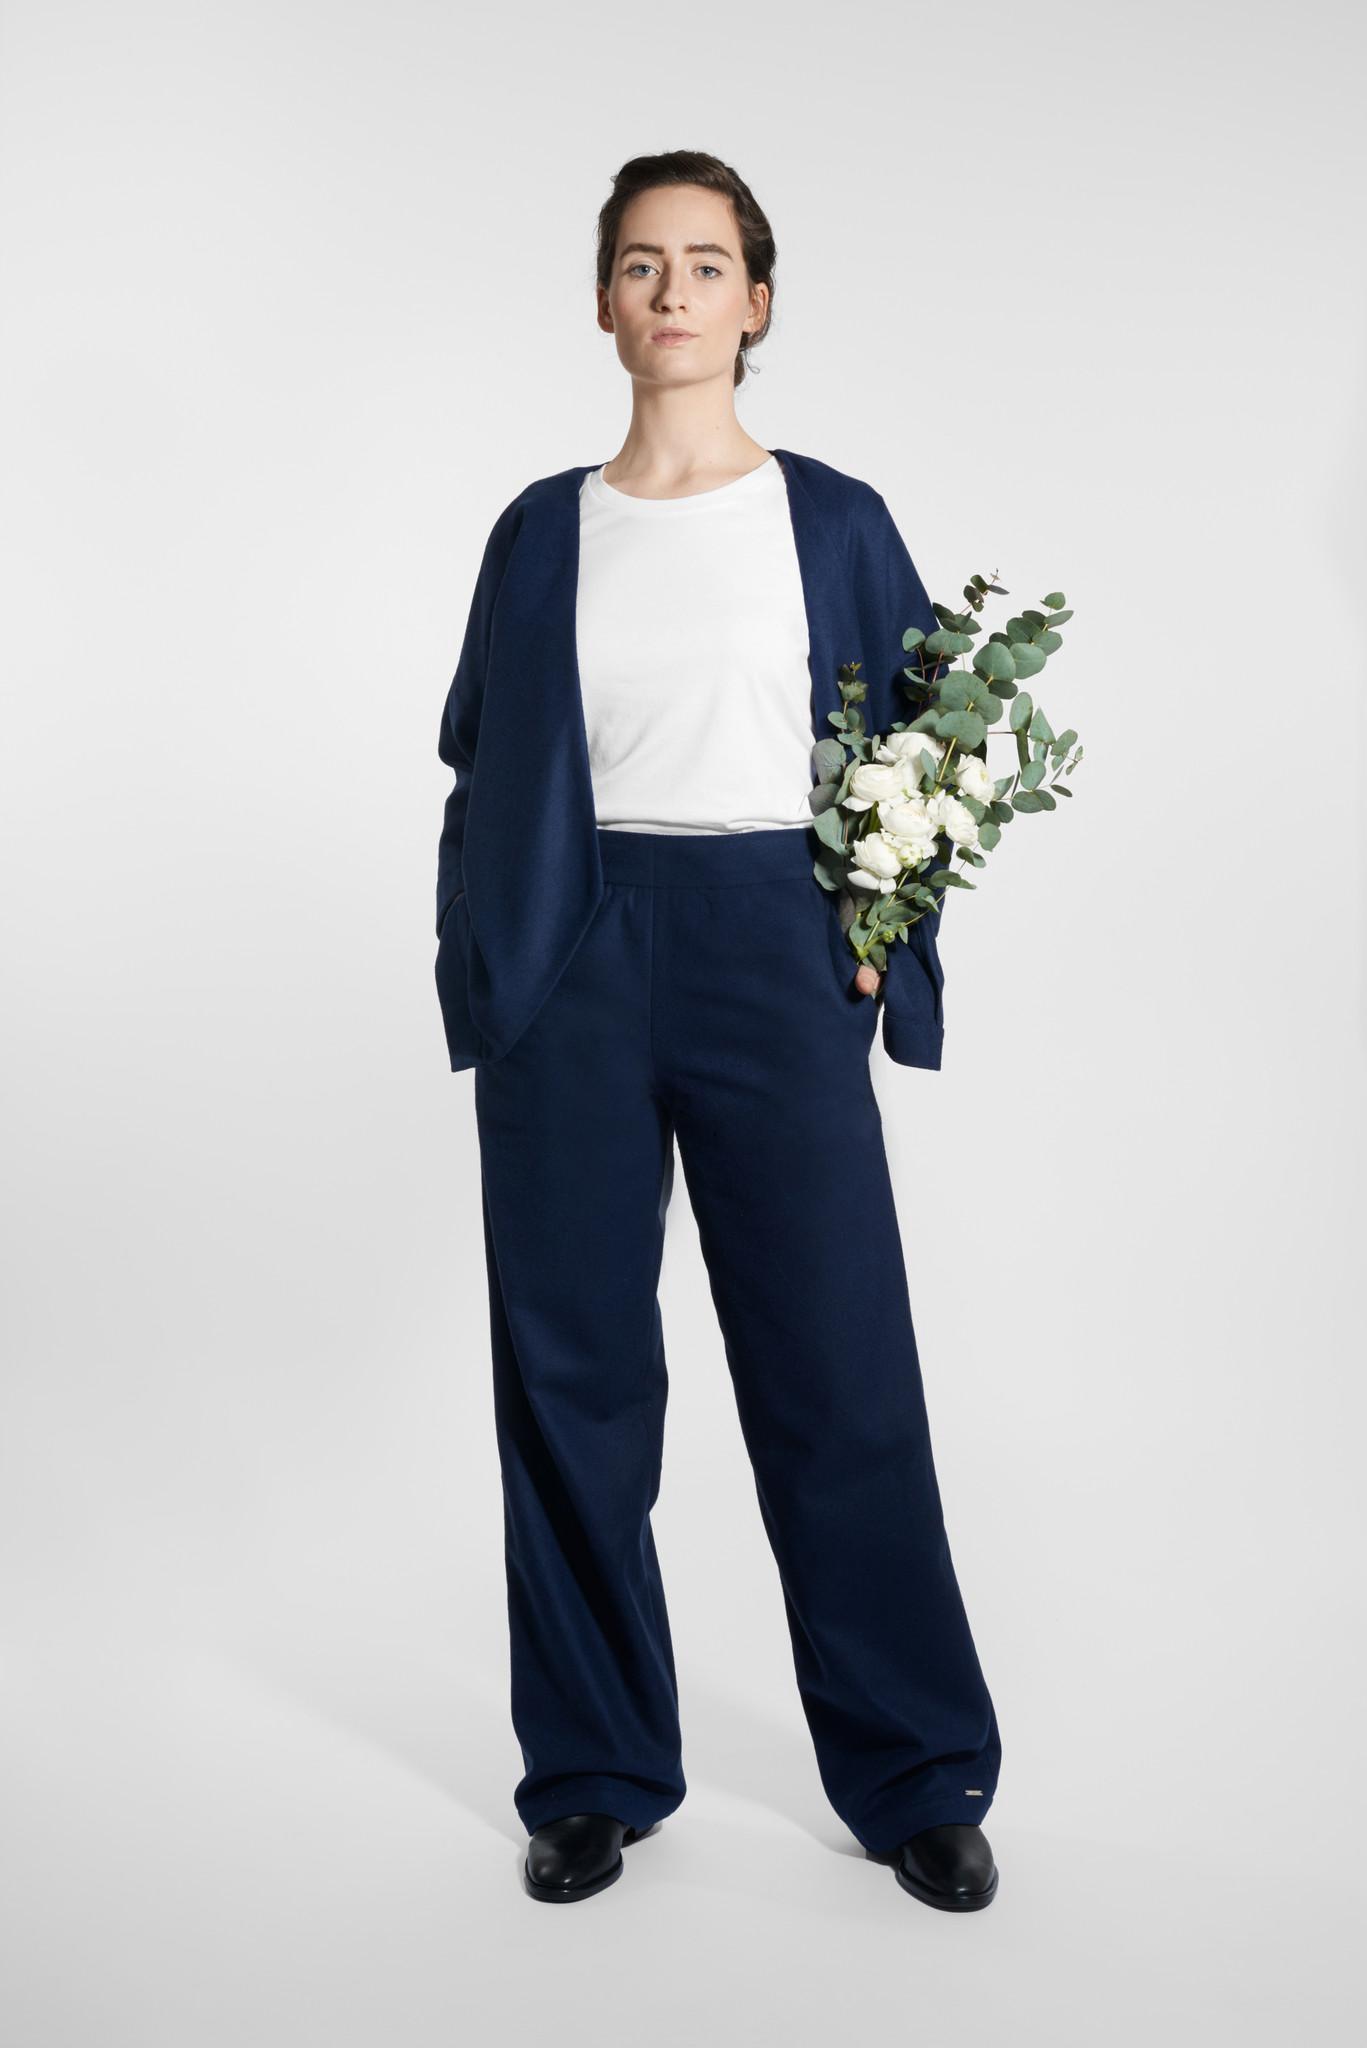 Kimono wool blend jacket - navy-2